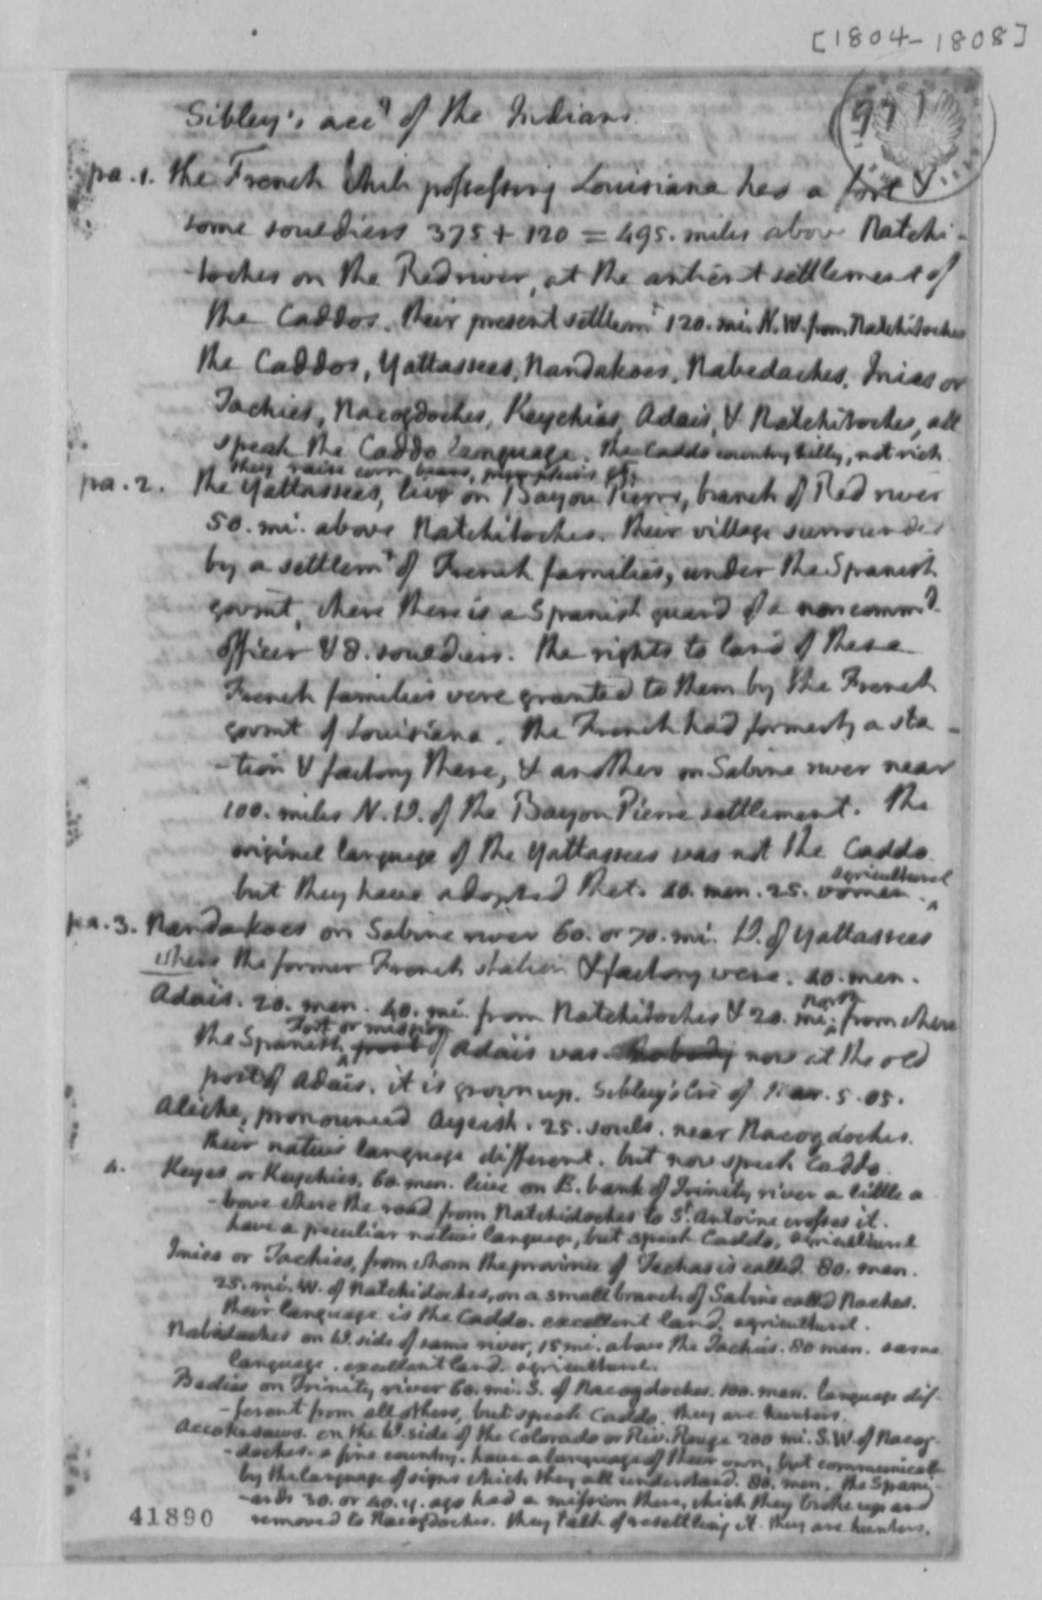 John Sibley, 1804, Account of Indians